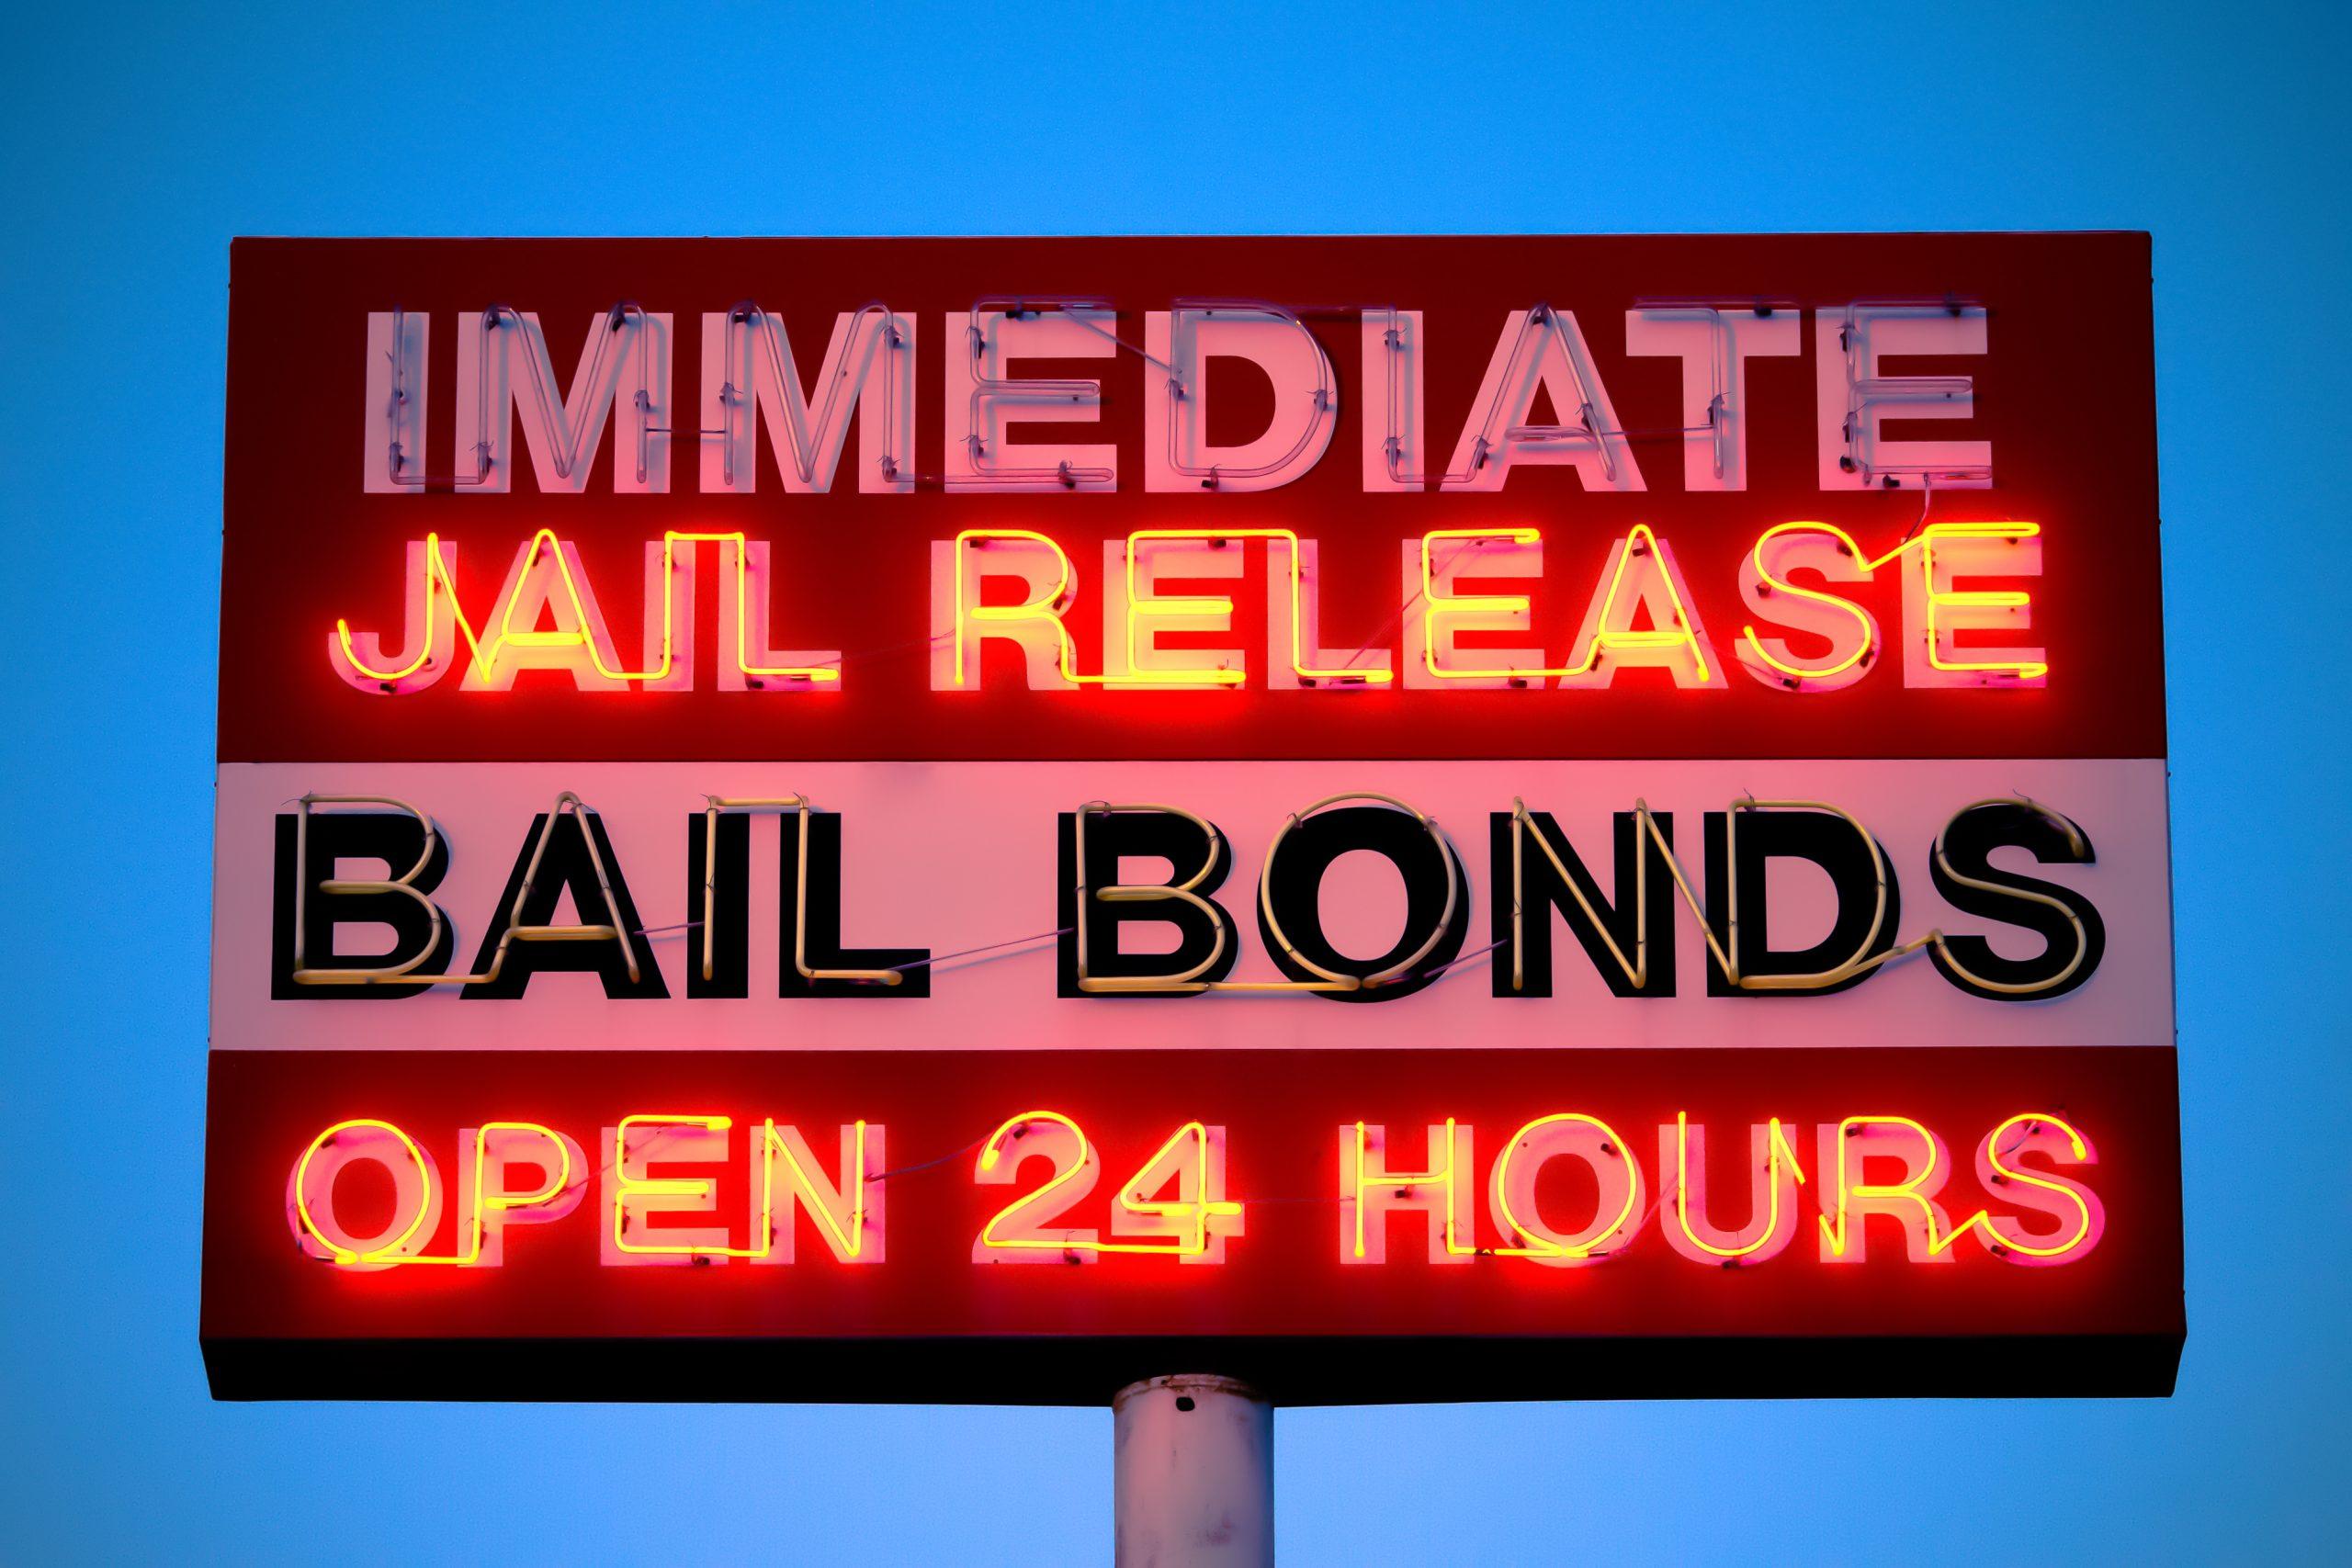 Cash Bail: Americas' Equity Dilemma